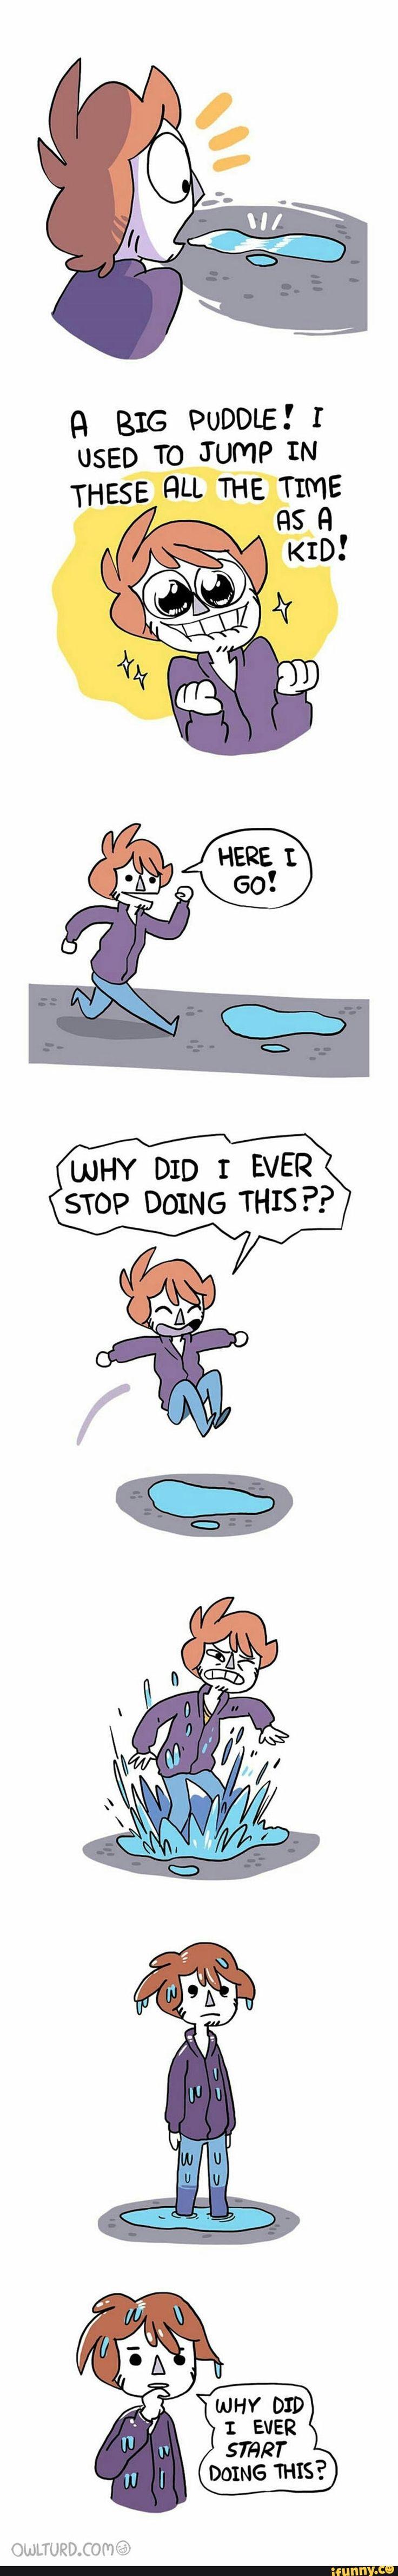 puddle, jumping, what, joy Owlturd comics, Bad decisions